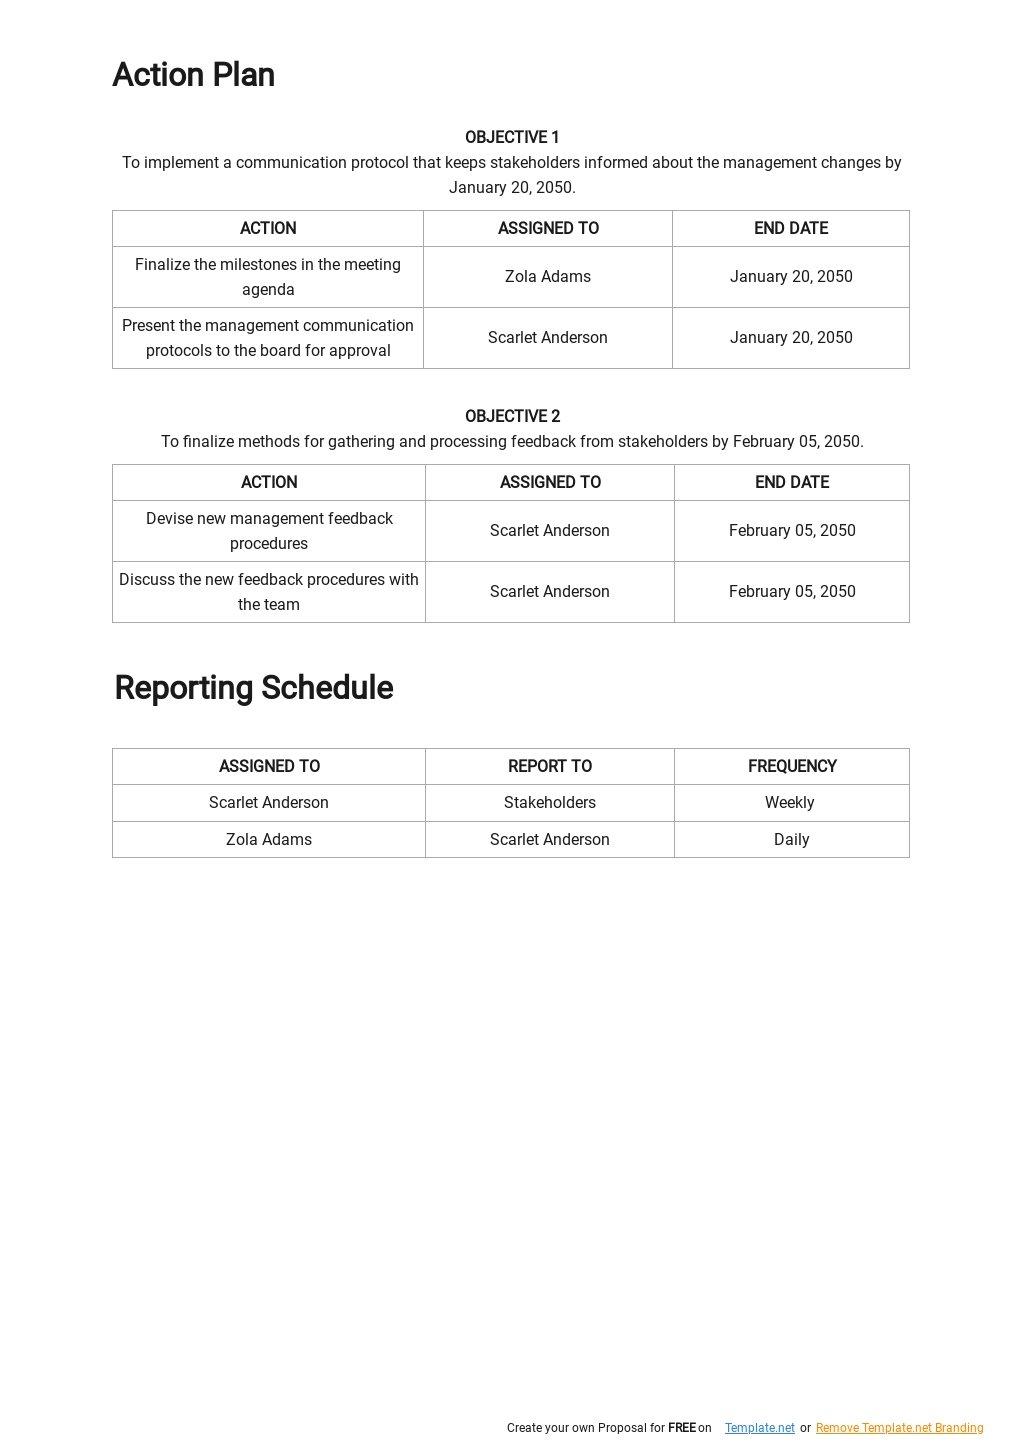 Change Management Communication Plan Template 2.jpe